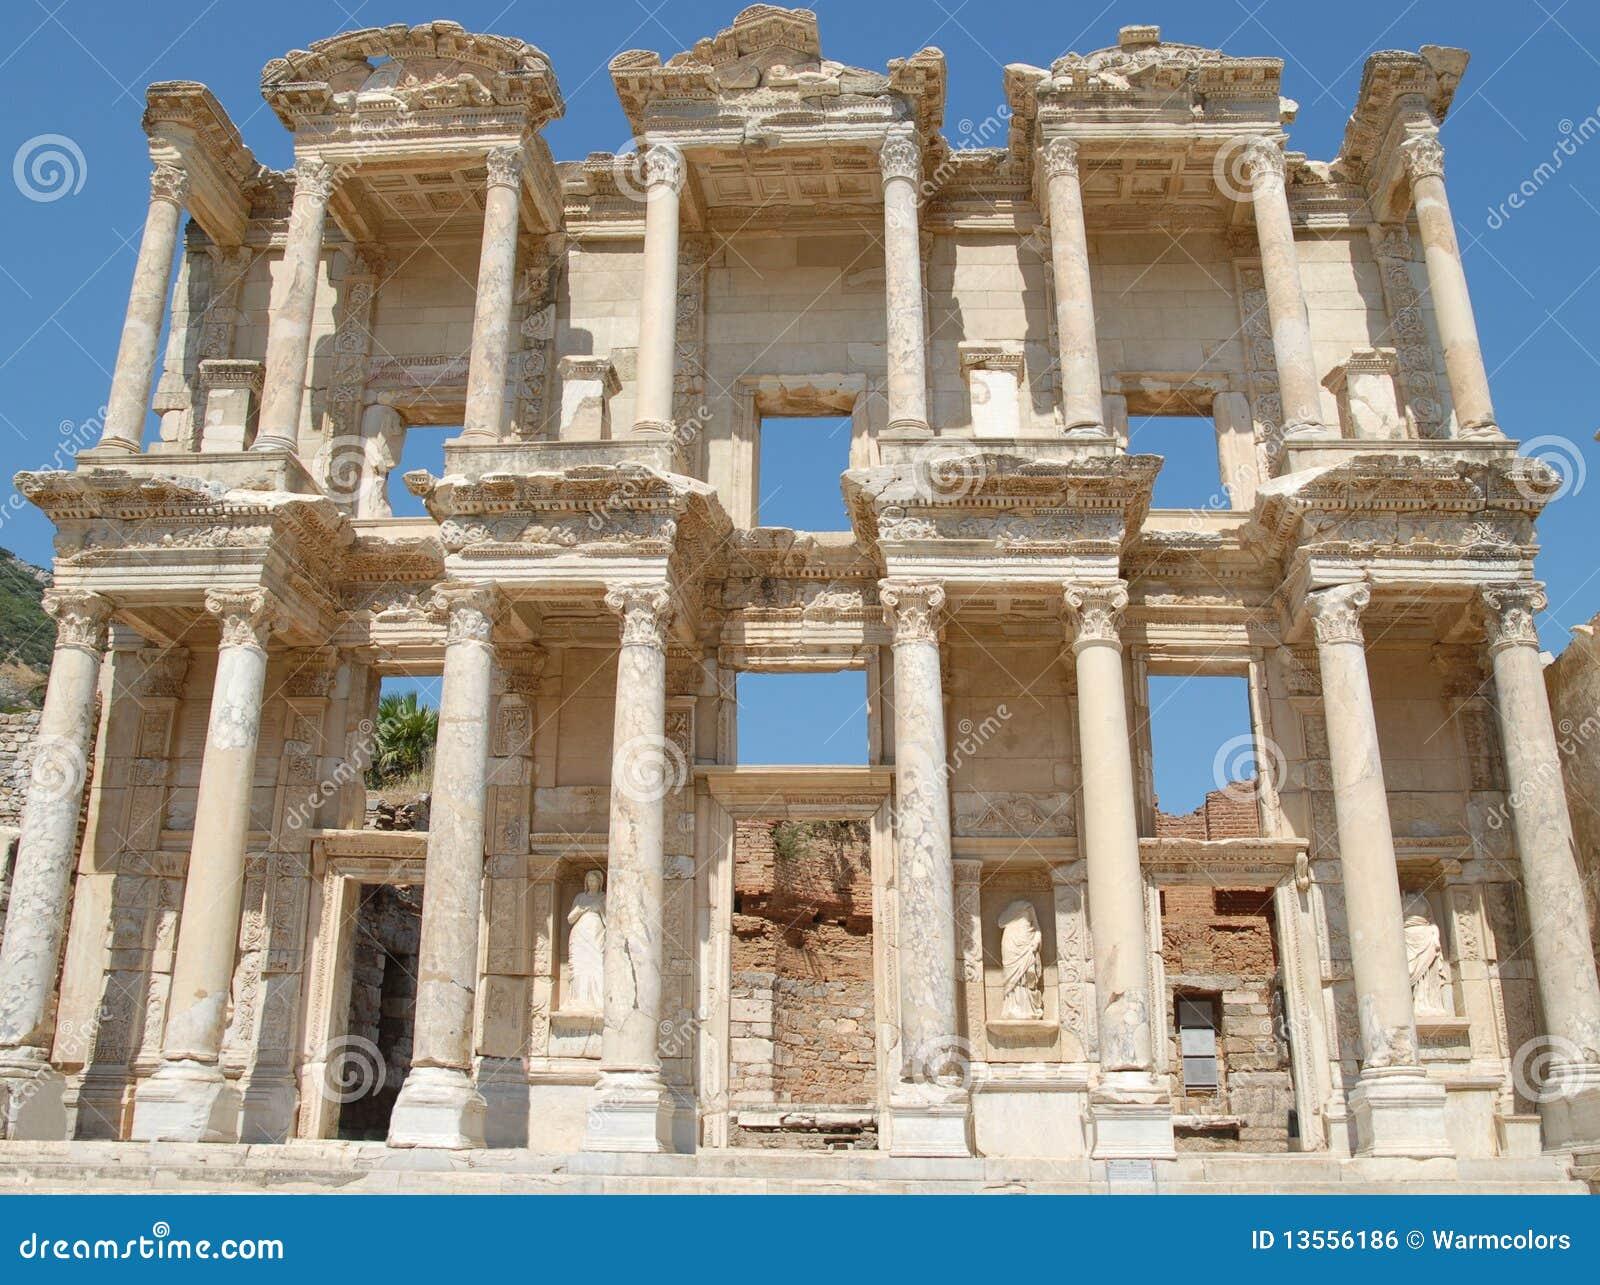 Celsus Library In Ephesus Asia Minor Turkey Royalty